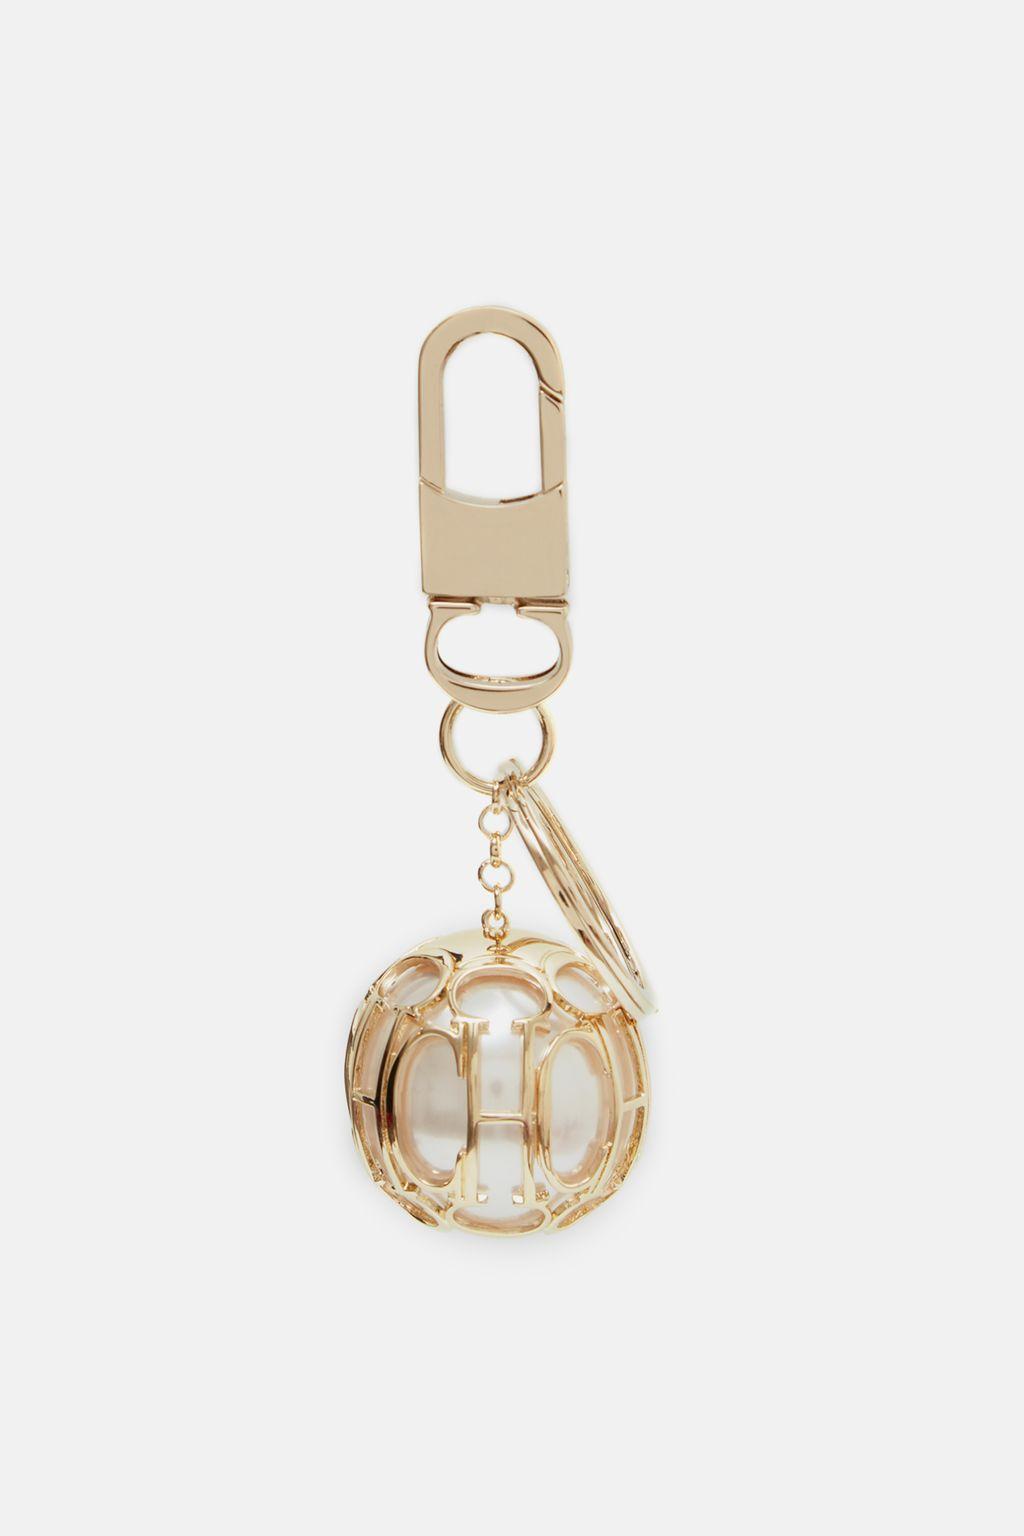 Oribe keychain